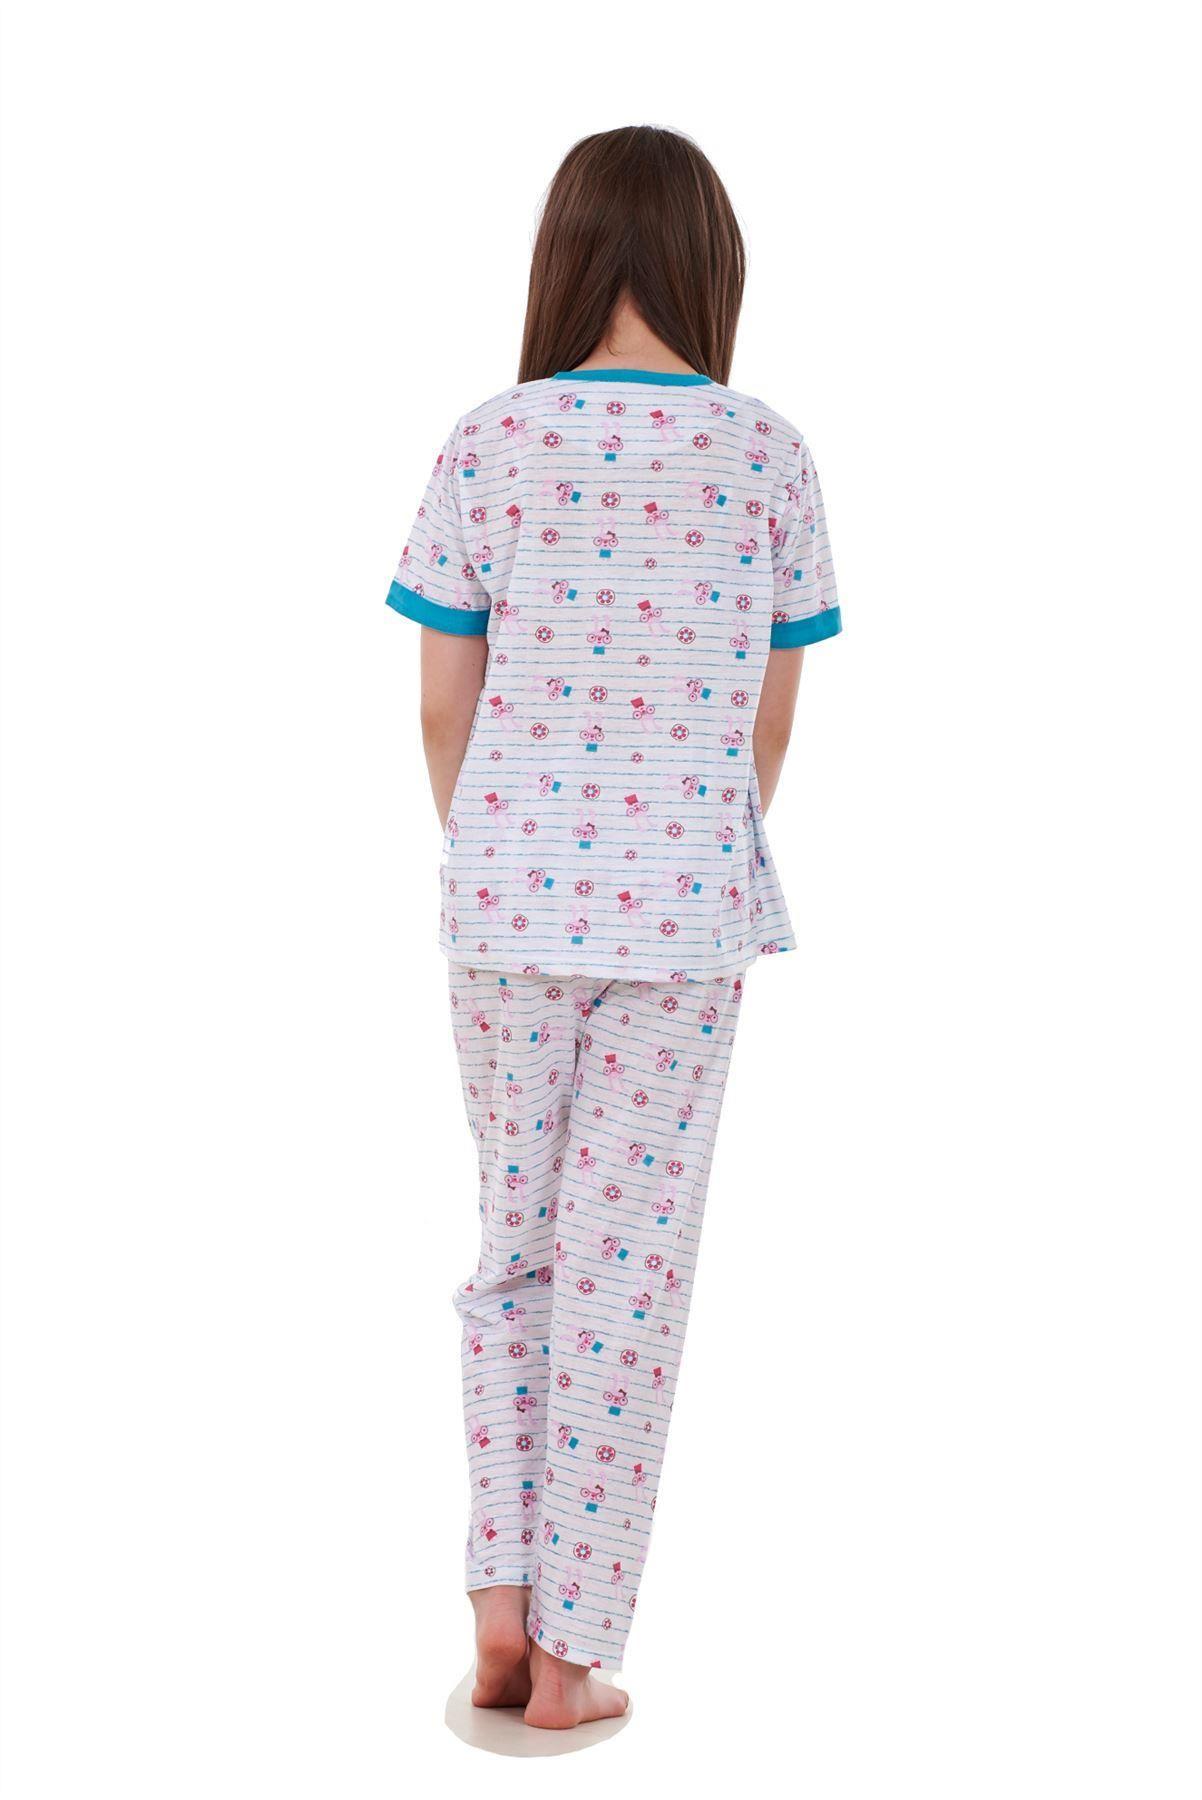 New Girls Kids Pyjamas Bunny Puppy Print Short Sleeve Soft Nightwear Year 4 to14